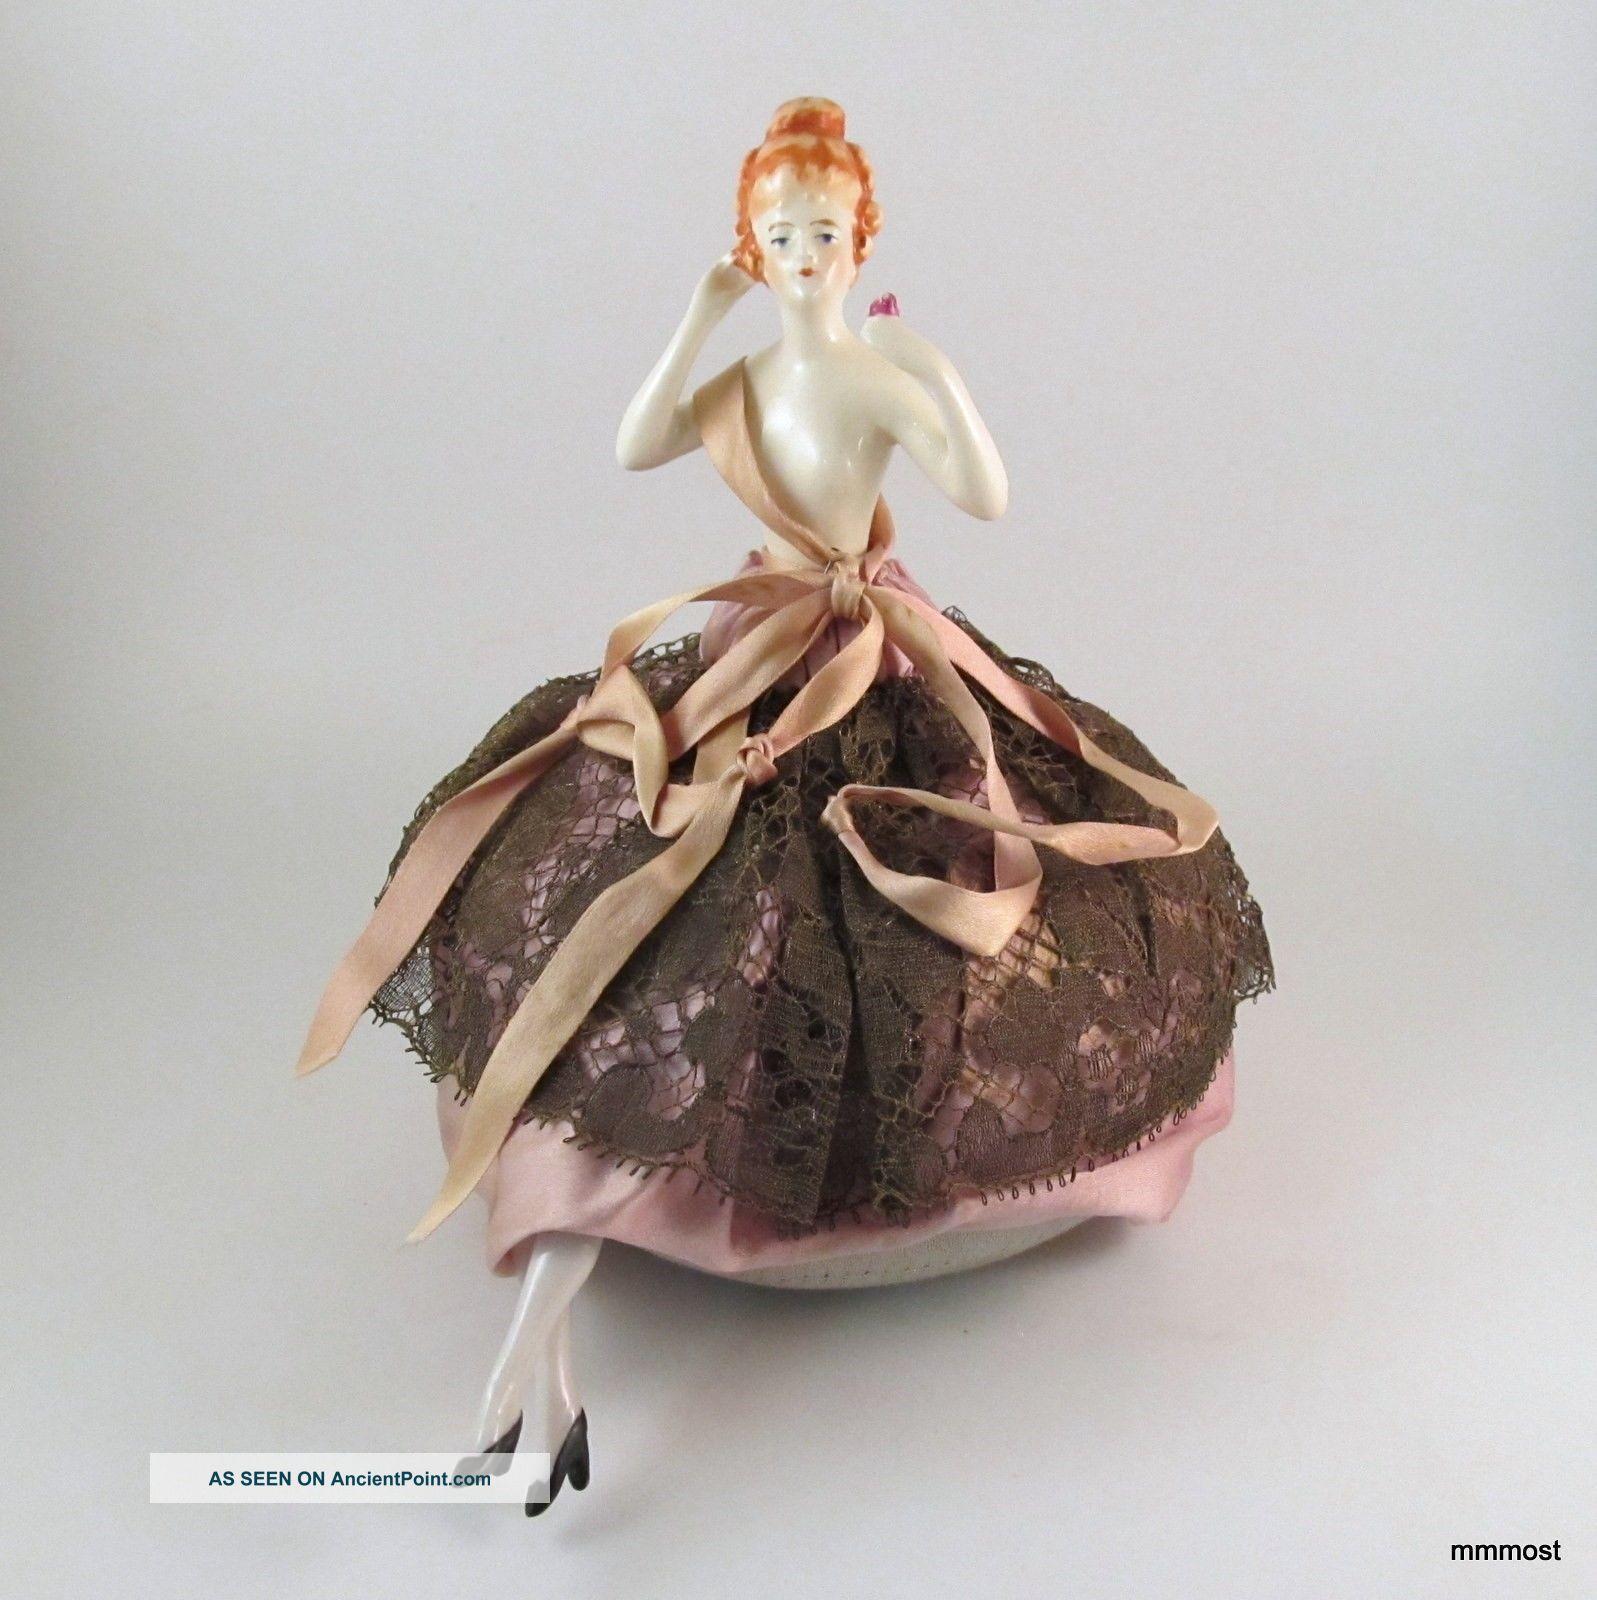 Vintage 1920s Lady Half Doll Pincushion Orange Hair Arm Out Metallic Lace Skirt Pin Cushions photo